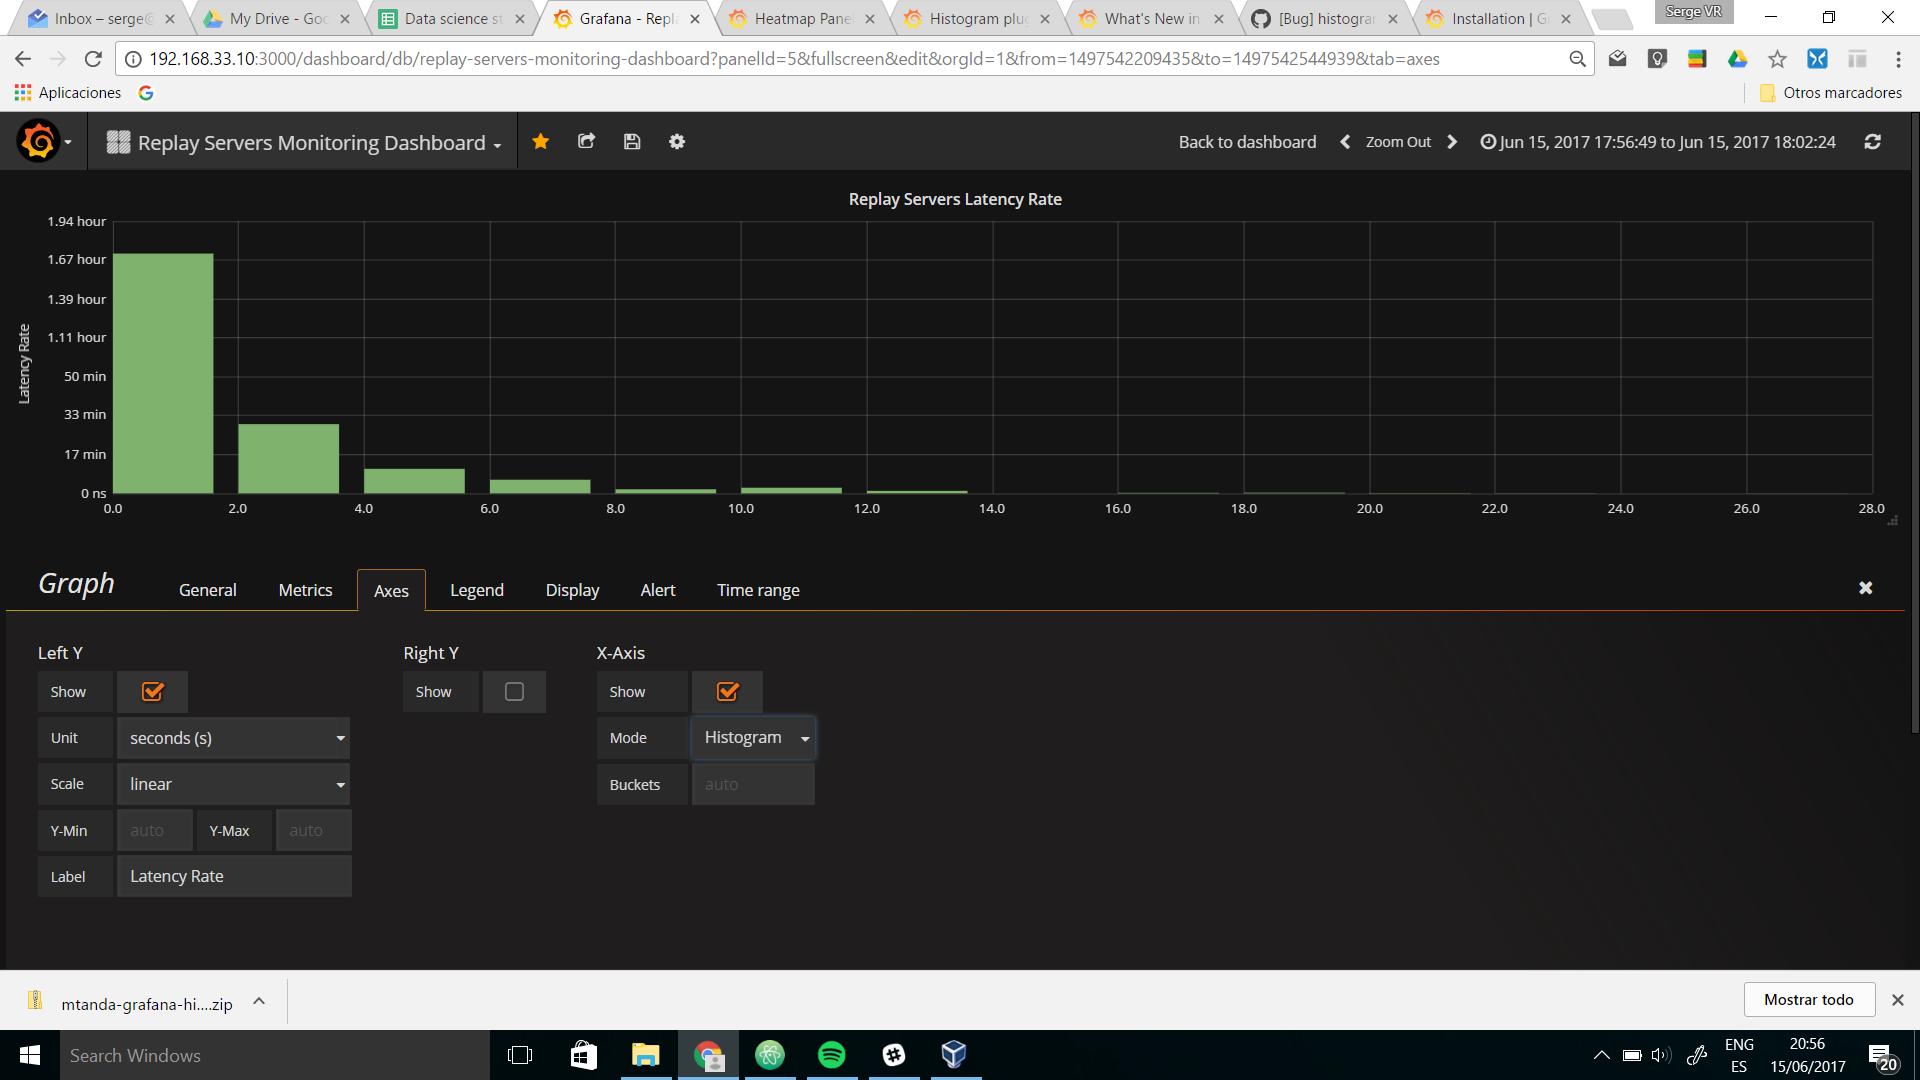 Bug] histogram in graph panel · Issue #8628 · grafana/grafana · GitHub